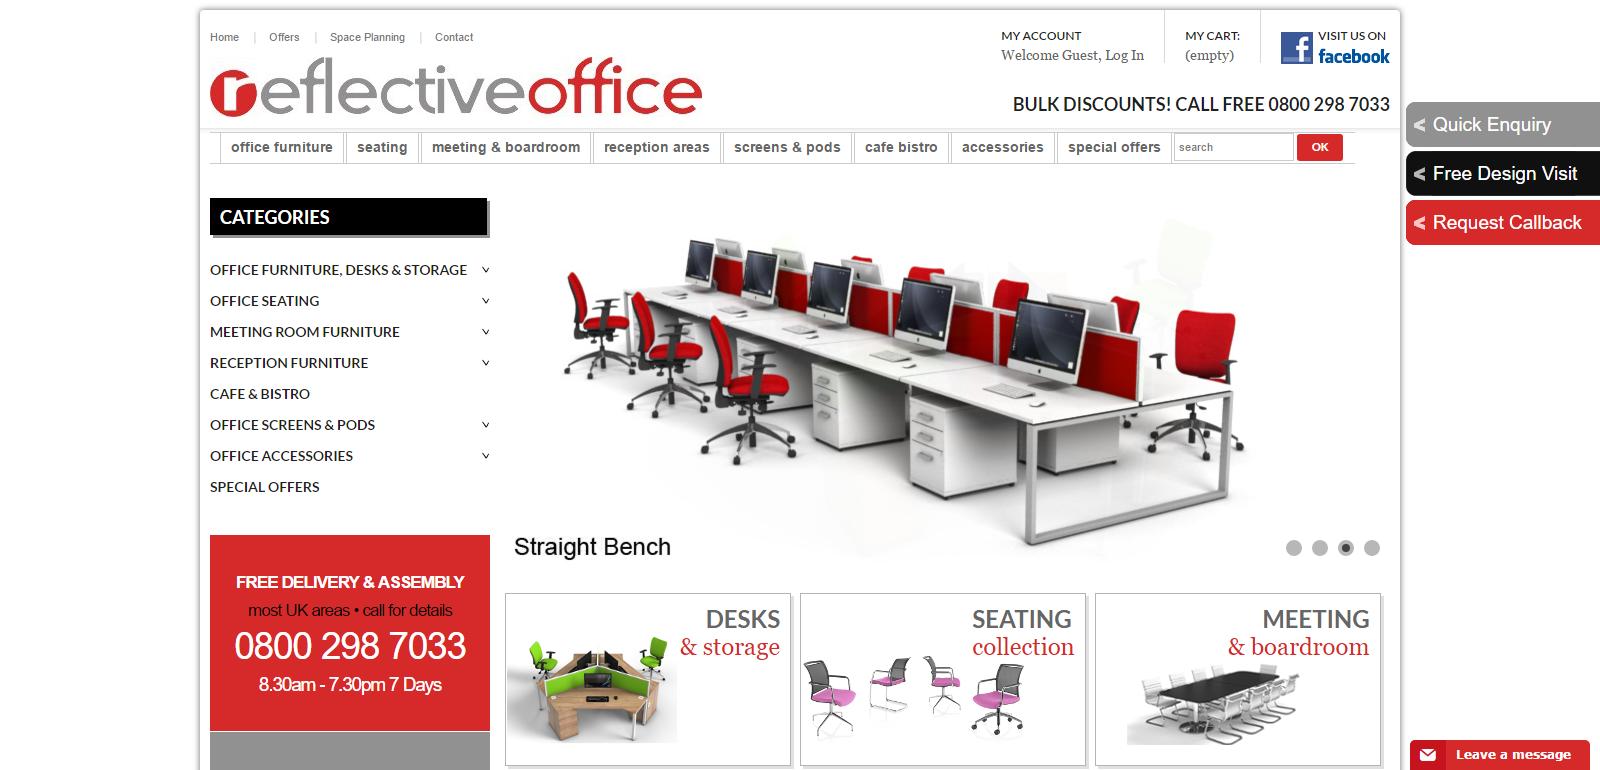 Reflective Office Website